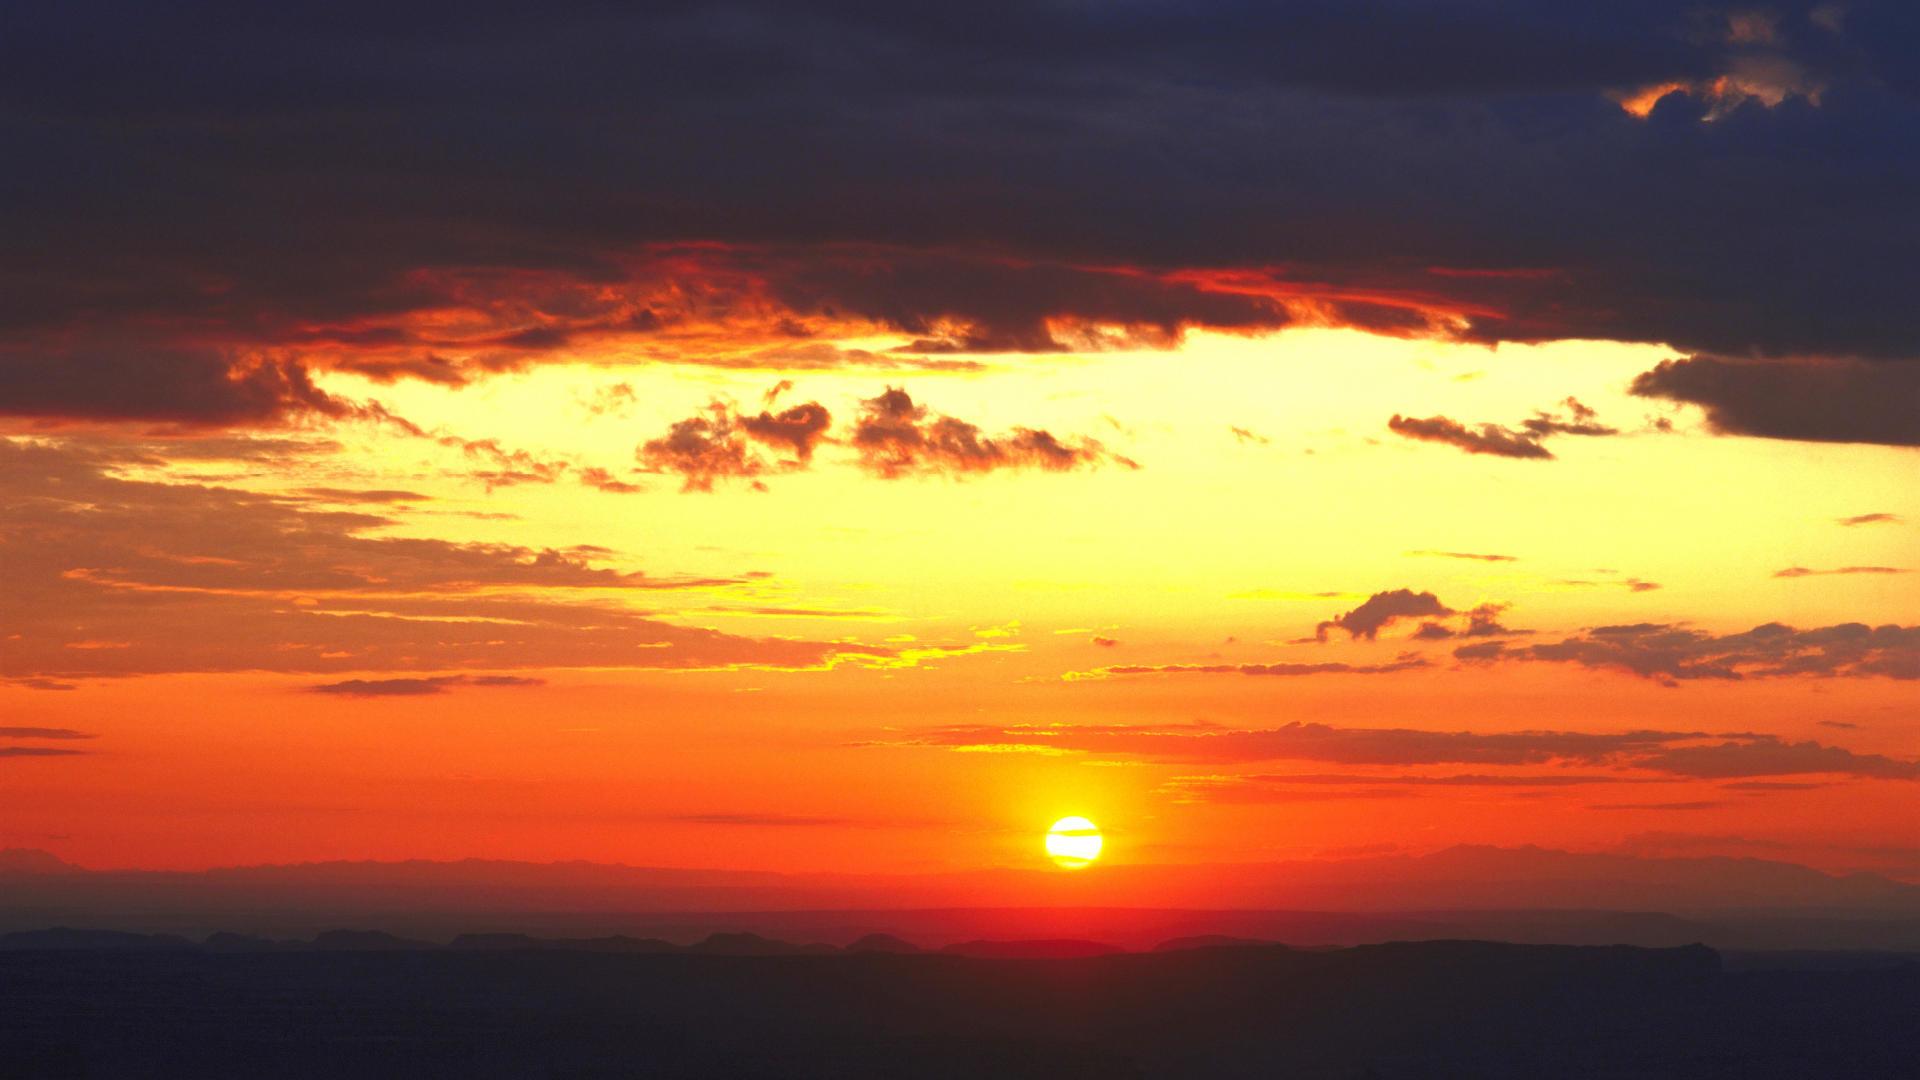 Cool Sunset (id: 96554)